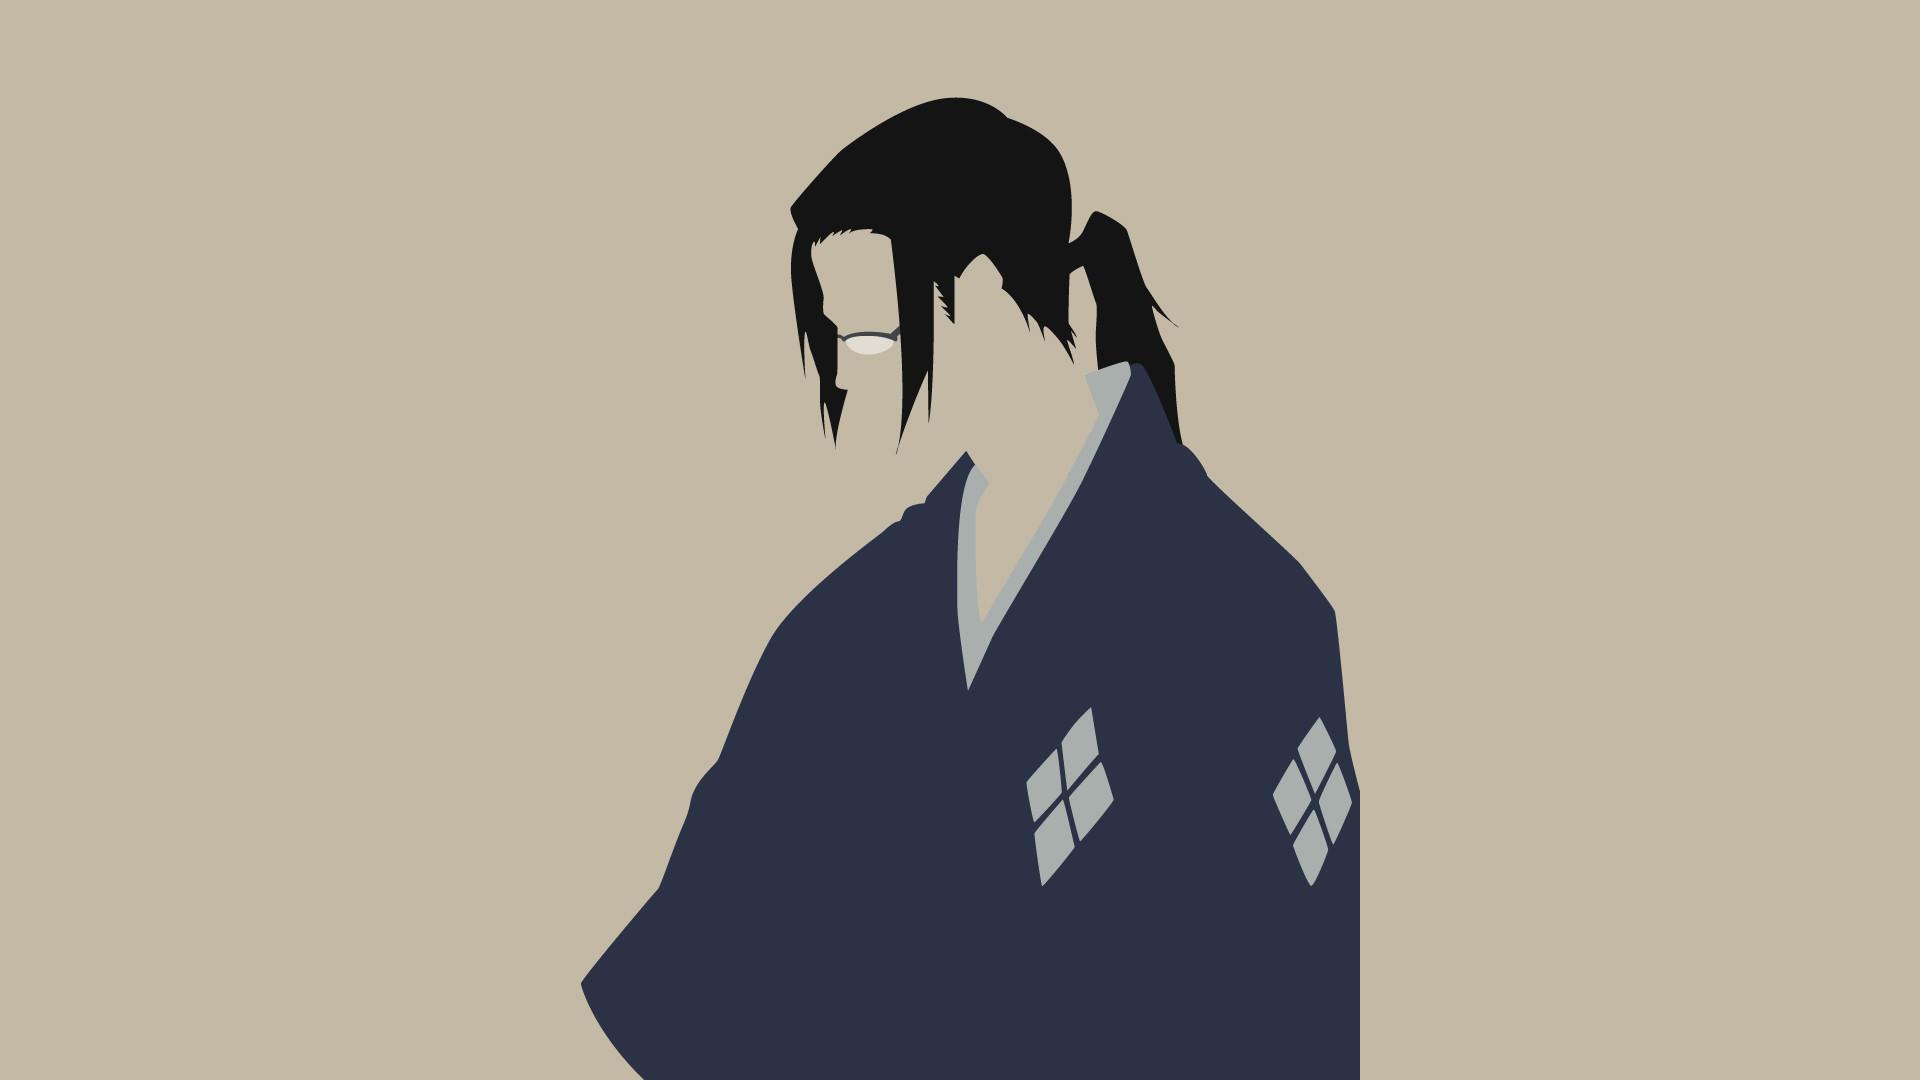 Samurai Champloo: Mugen Minimalist by Krukmeister on DeviantArt